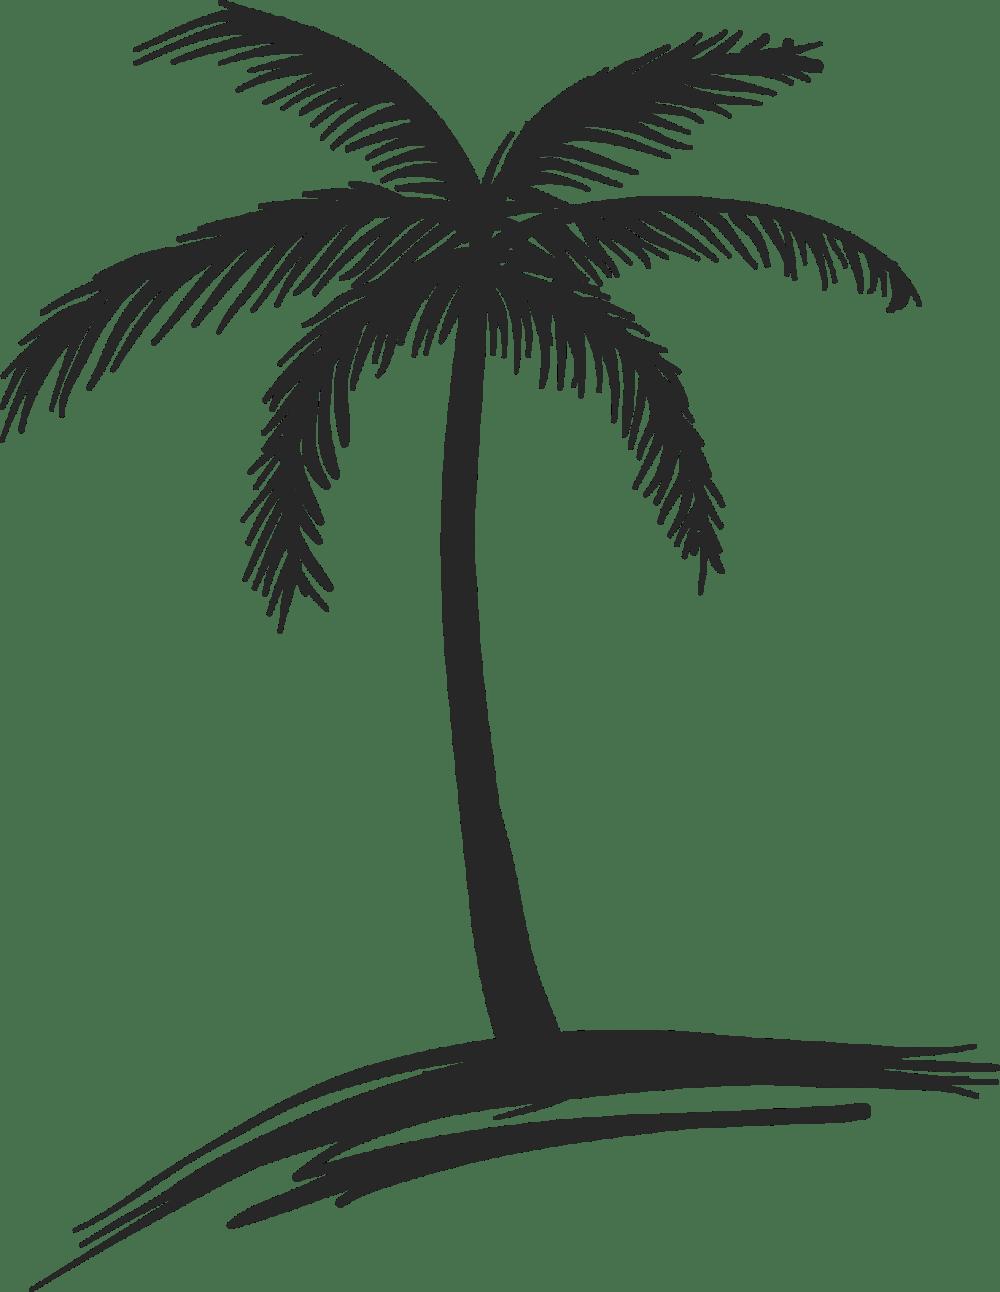 medium resolution of palm trees drawings